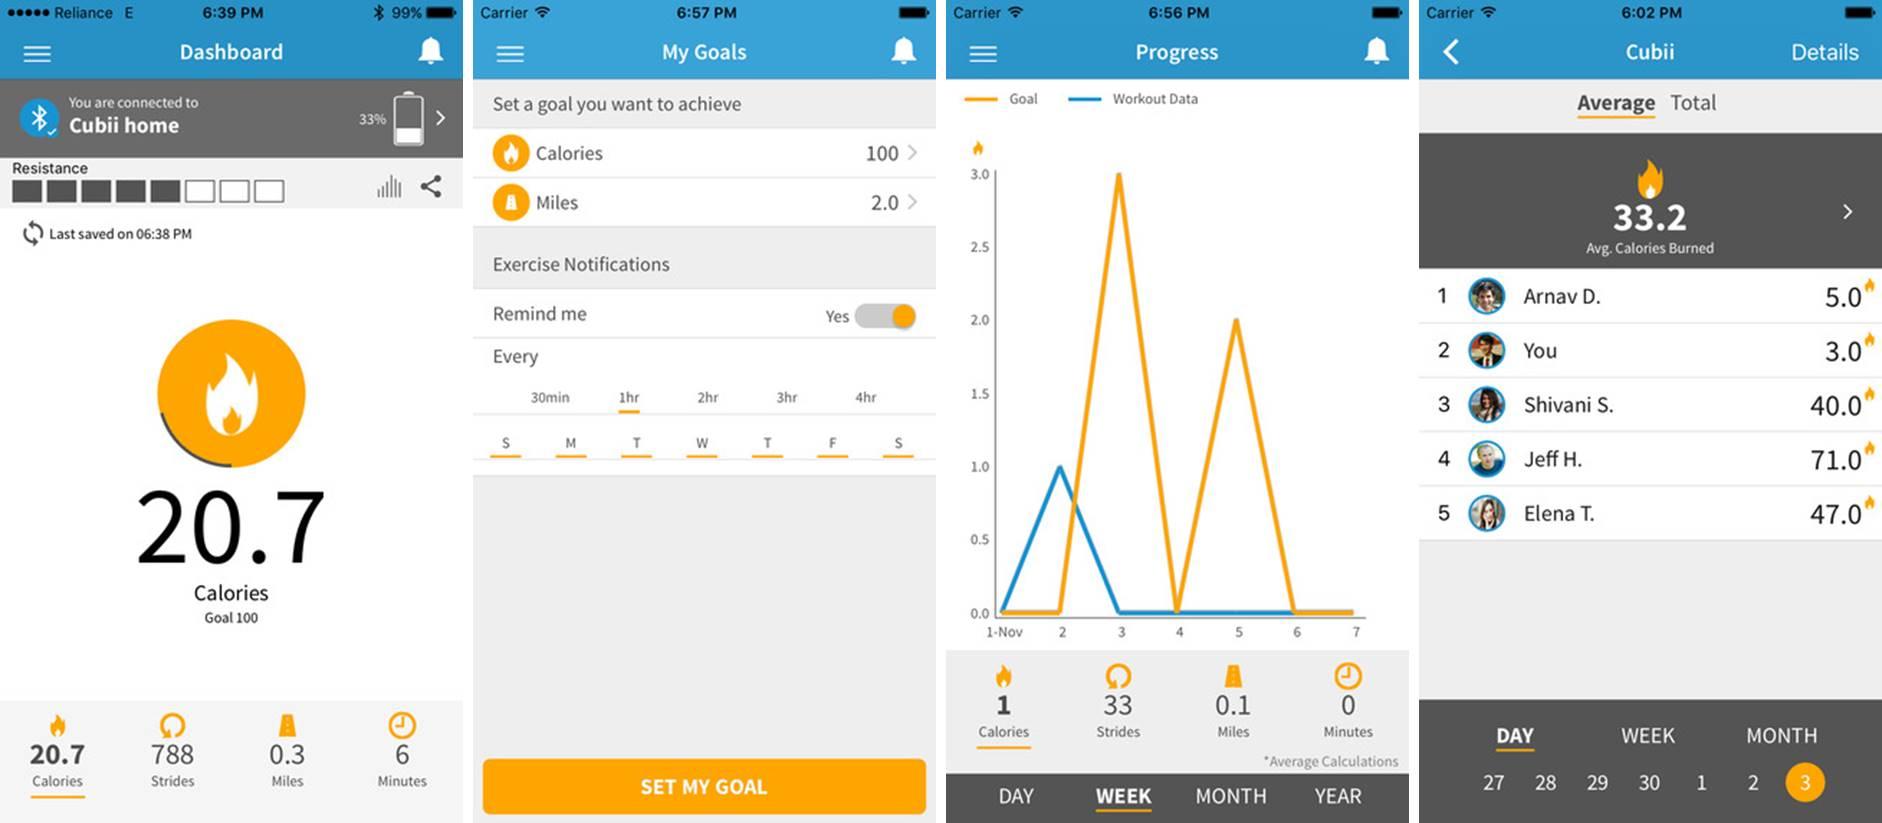 Cubii fitness app screenshots tracking eliptical use